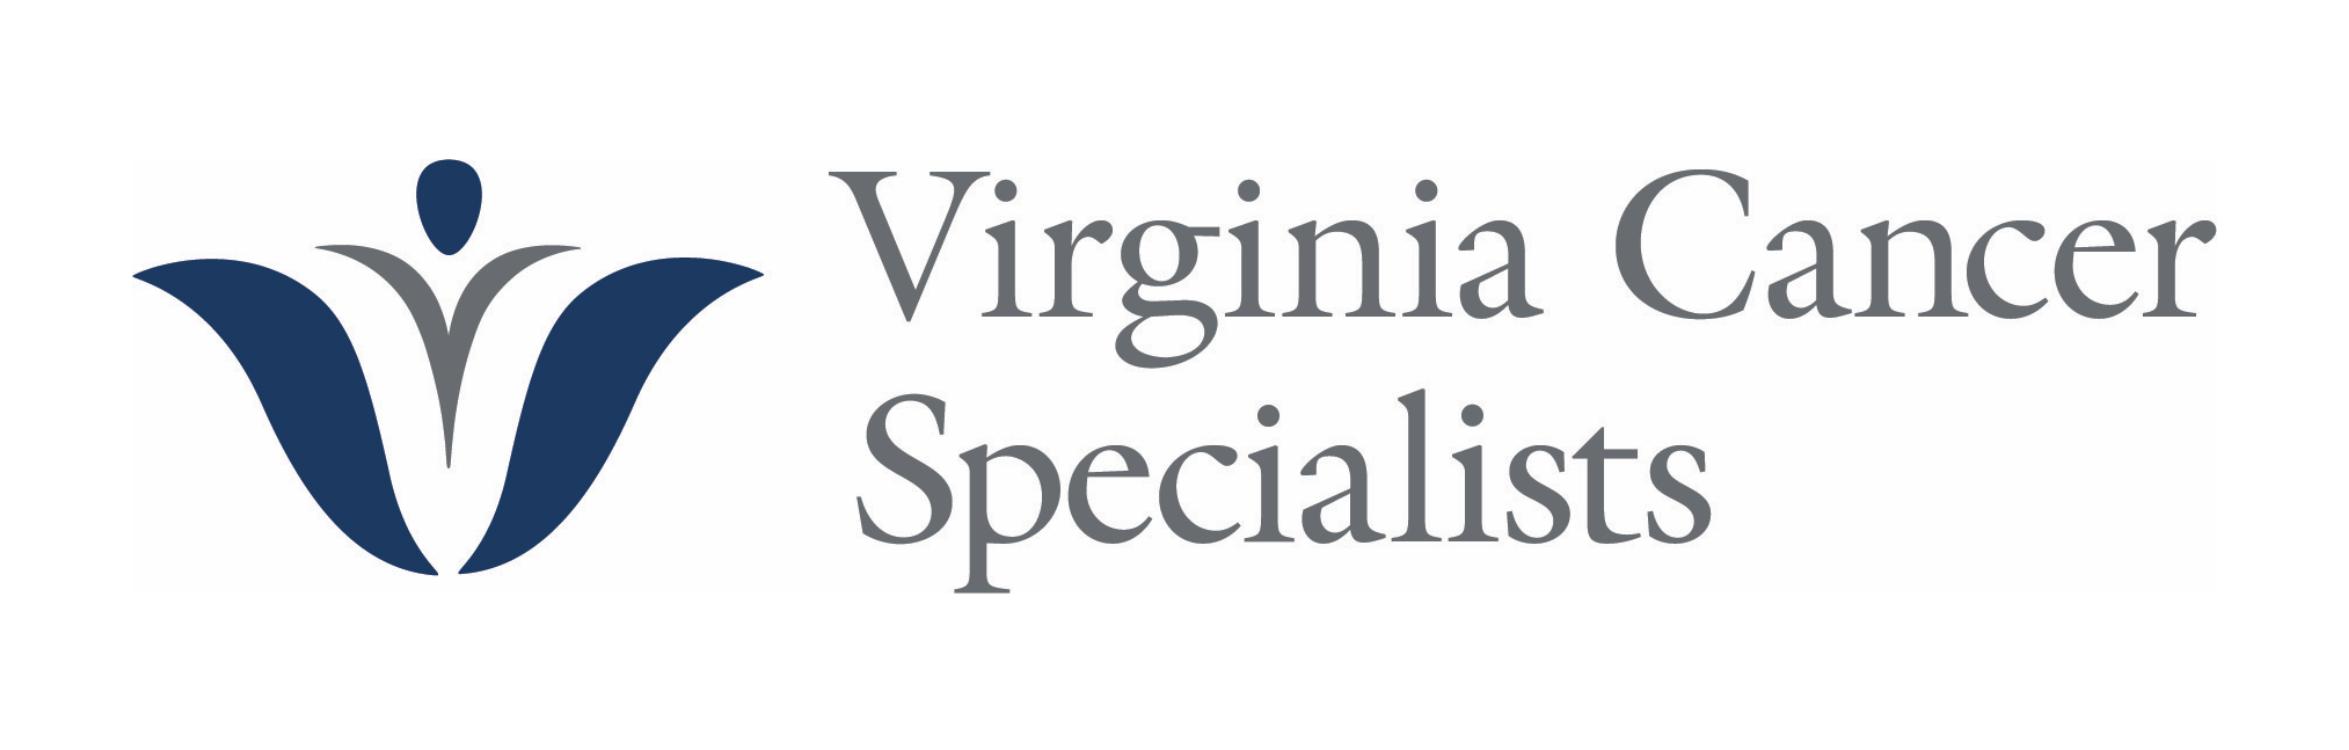 Virginia Cancer Specialists